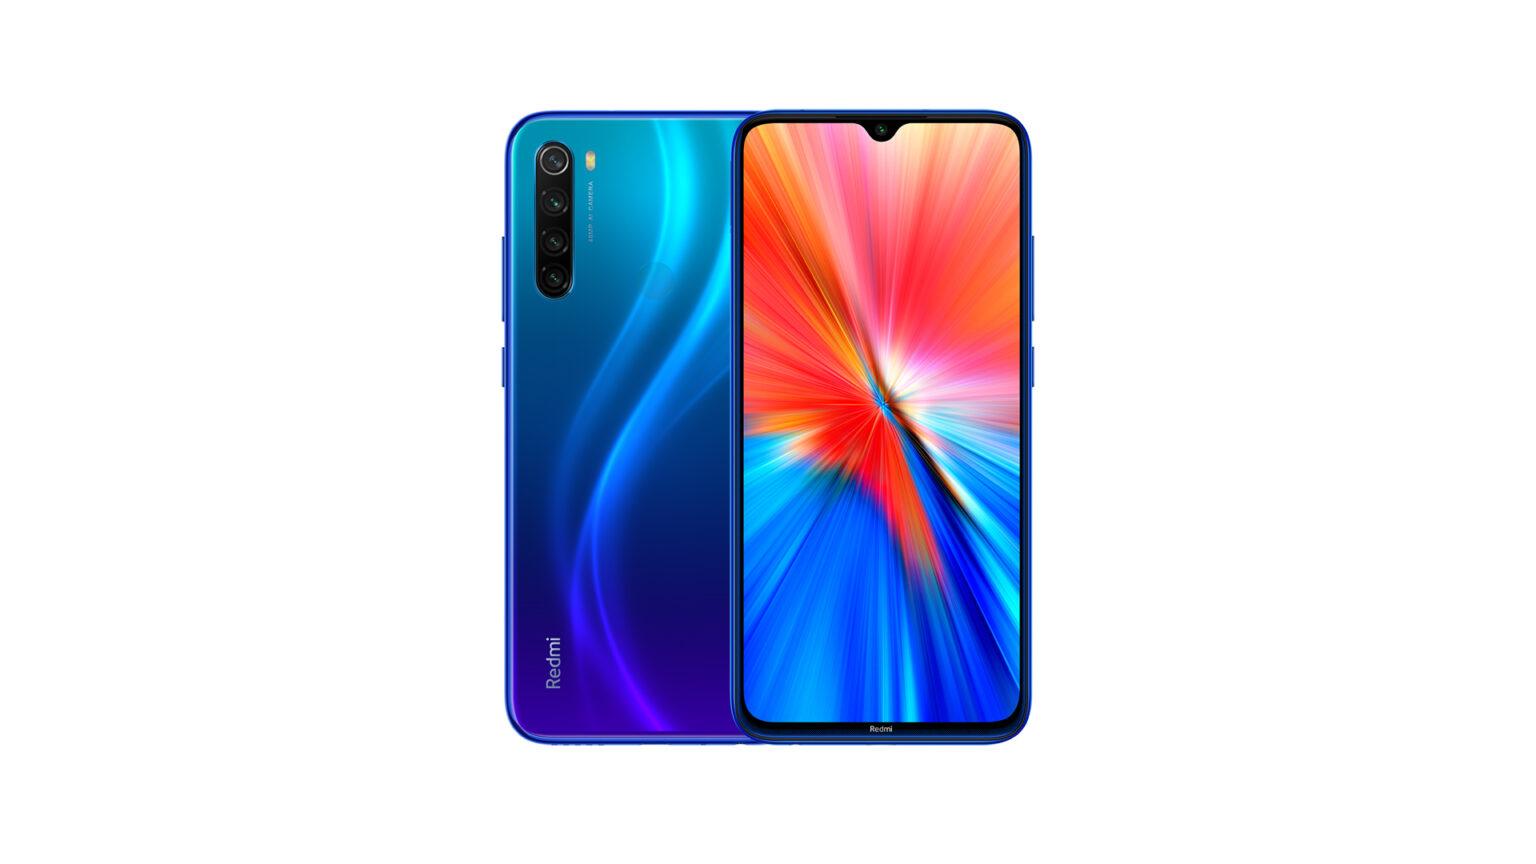 Harga redmi note 8 pro 2021 surabaya. Spesifikasi Xiaomi Redmi Note 8 2021, Harga Terbaru dan Kelebihannya